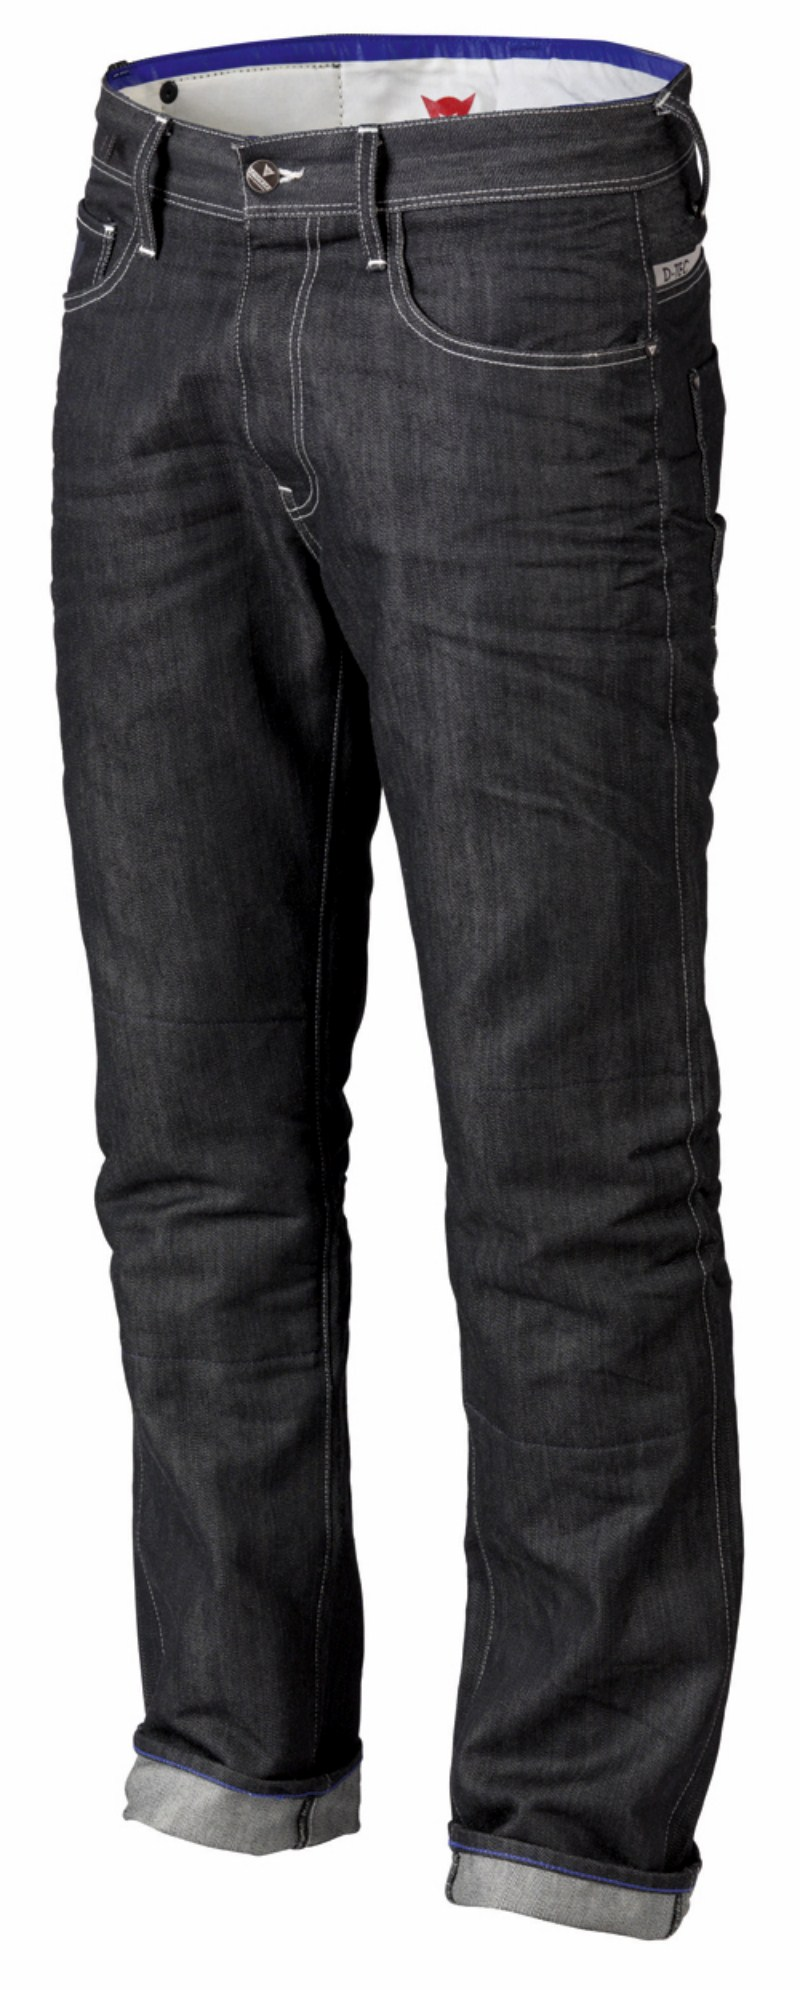 Pantaloni moto jeans Dainese D6 Kevlar colore denim